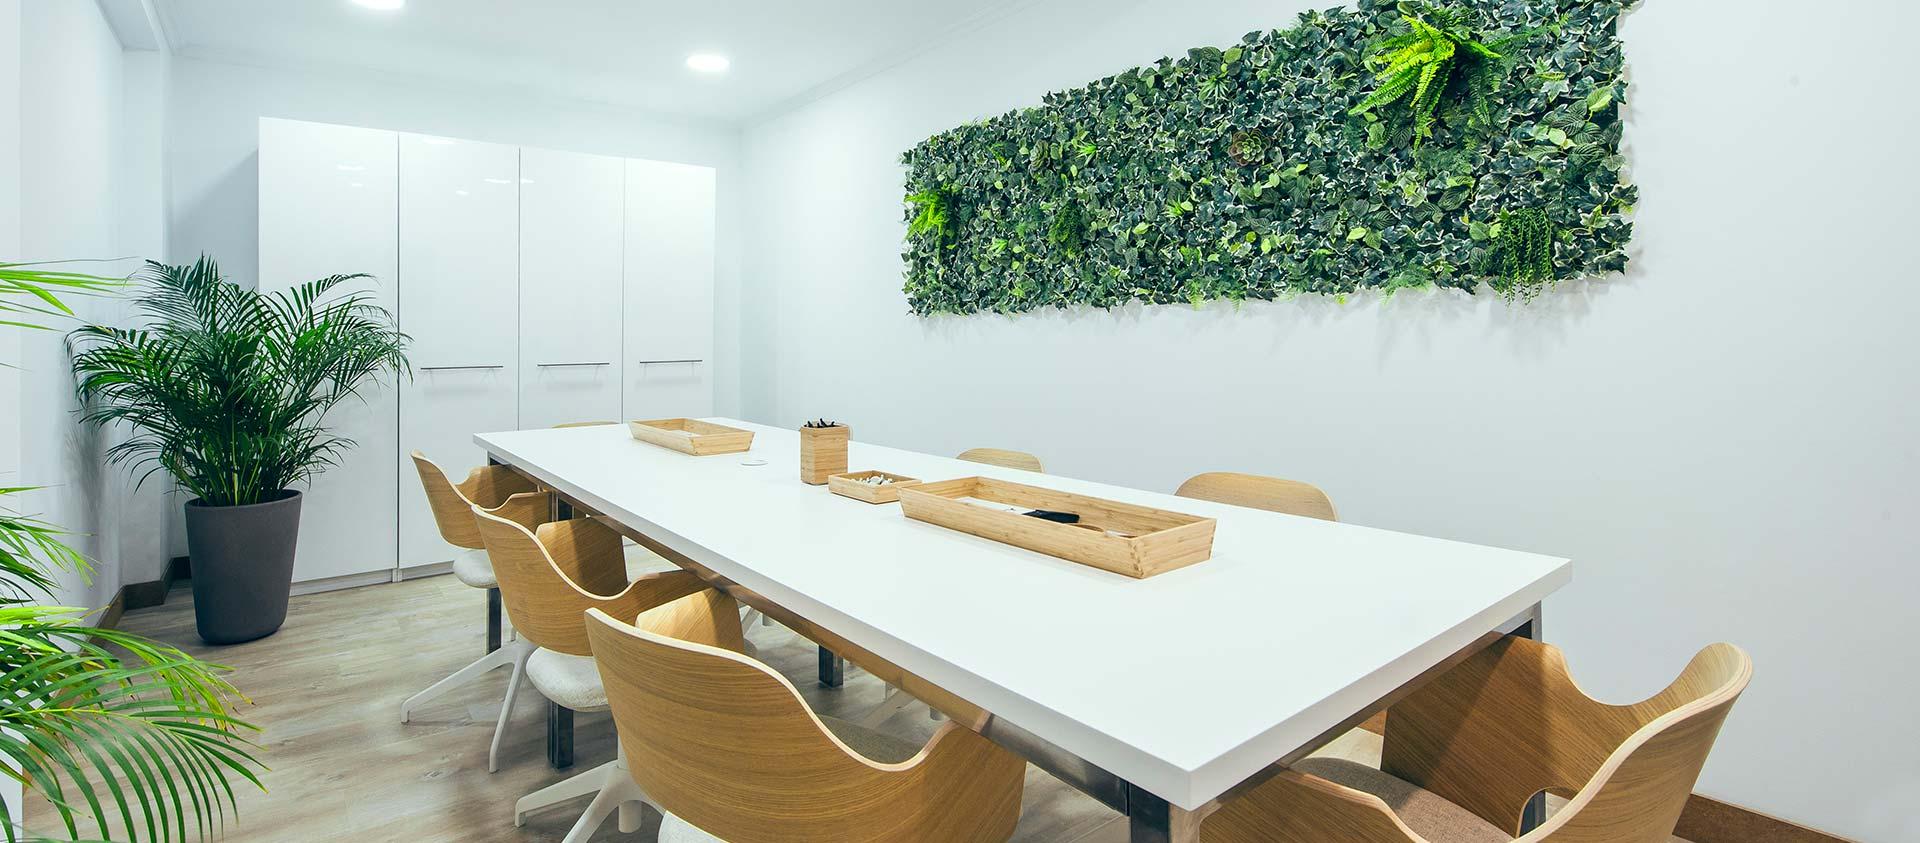 Sala de reuniones de Ivory Soluciones